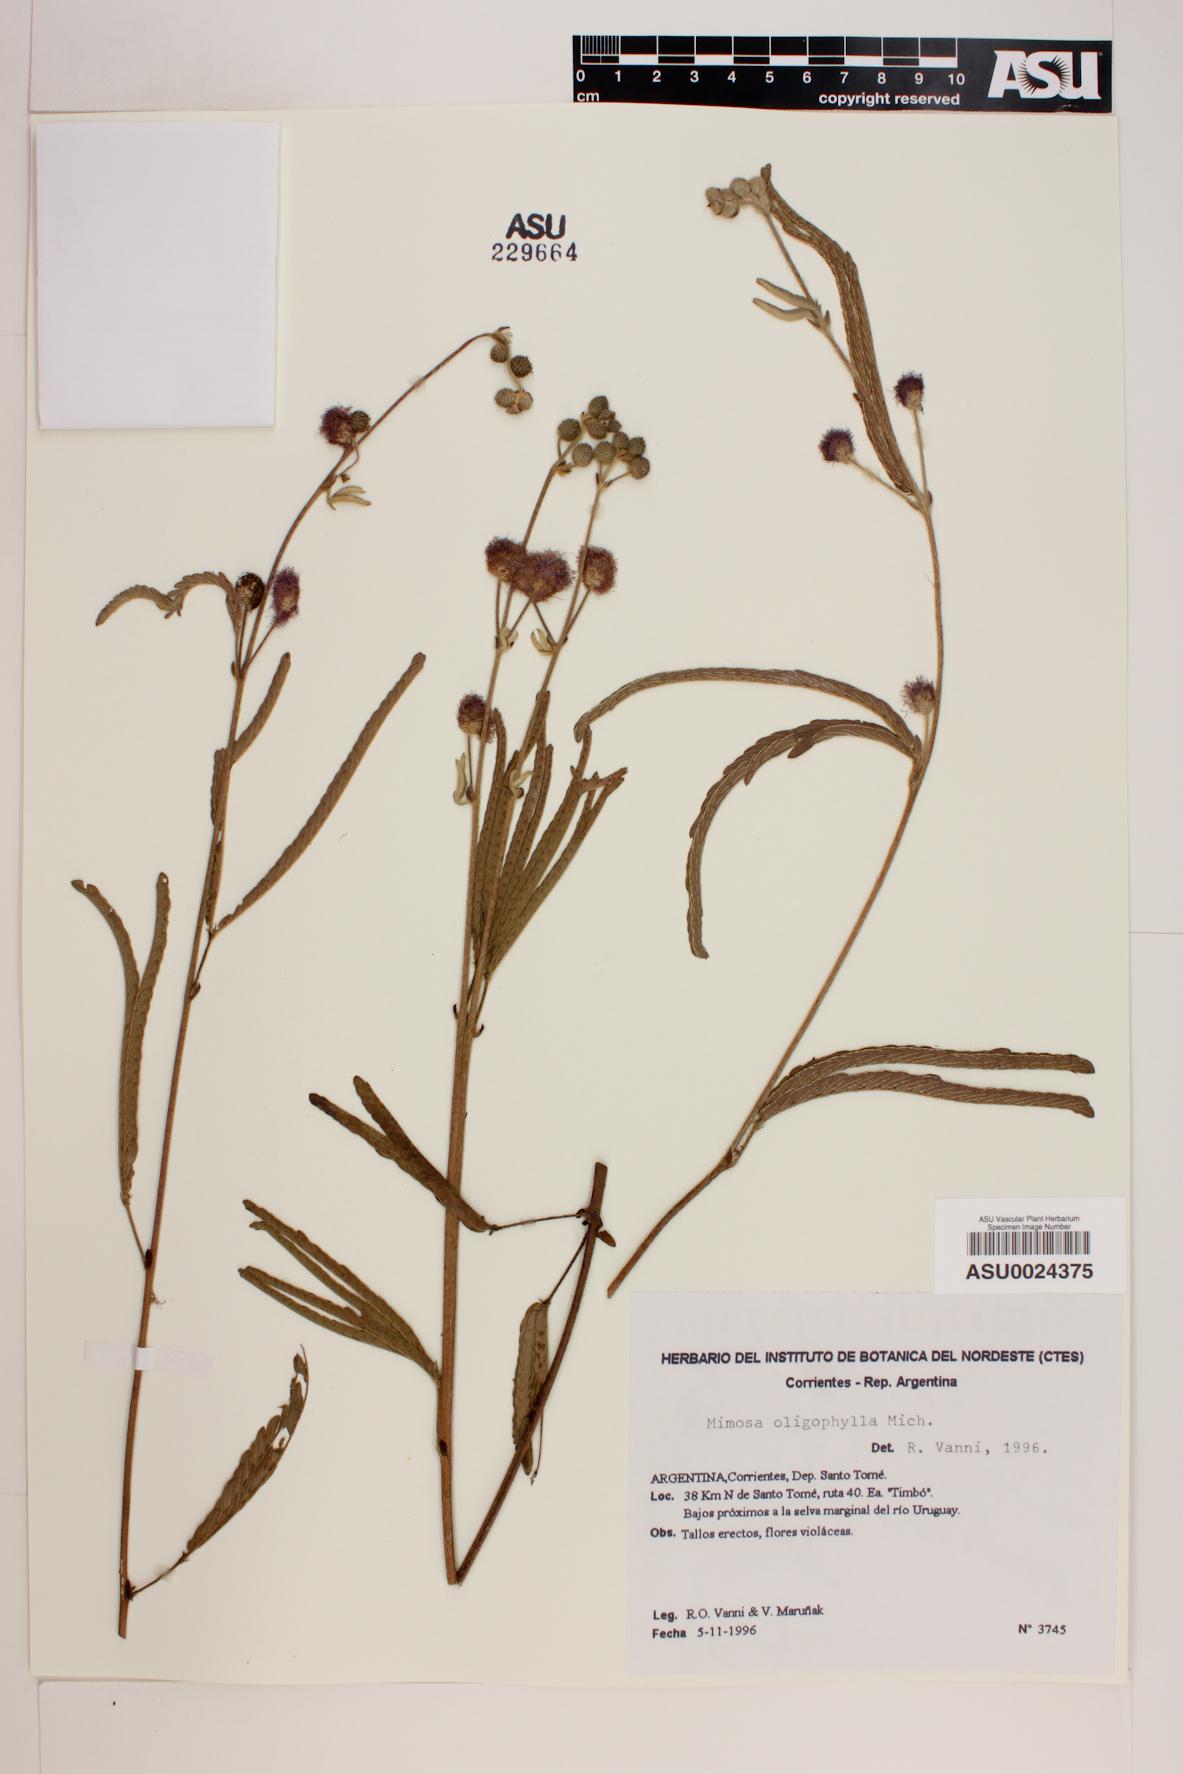 Mimosa oligophylla image